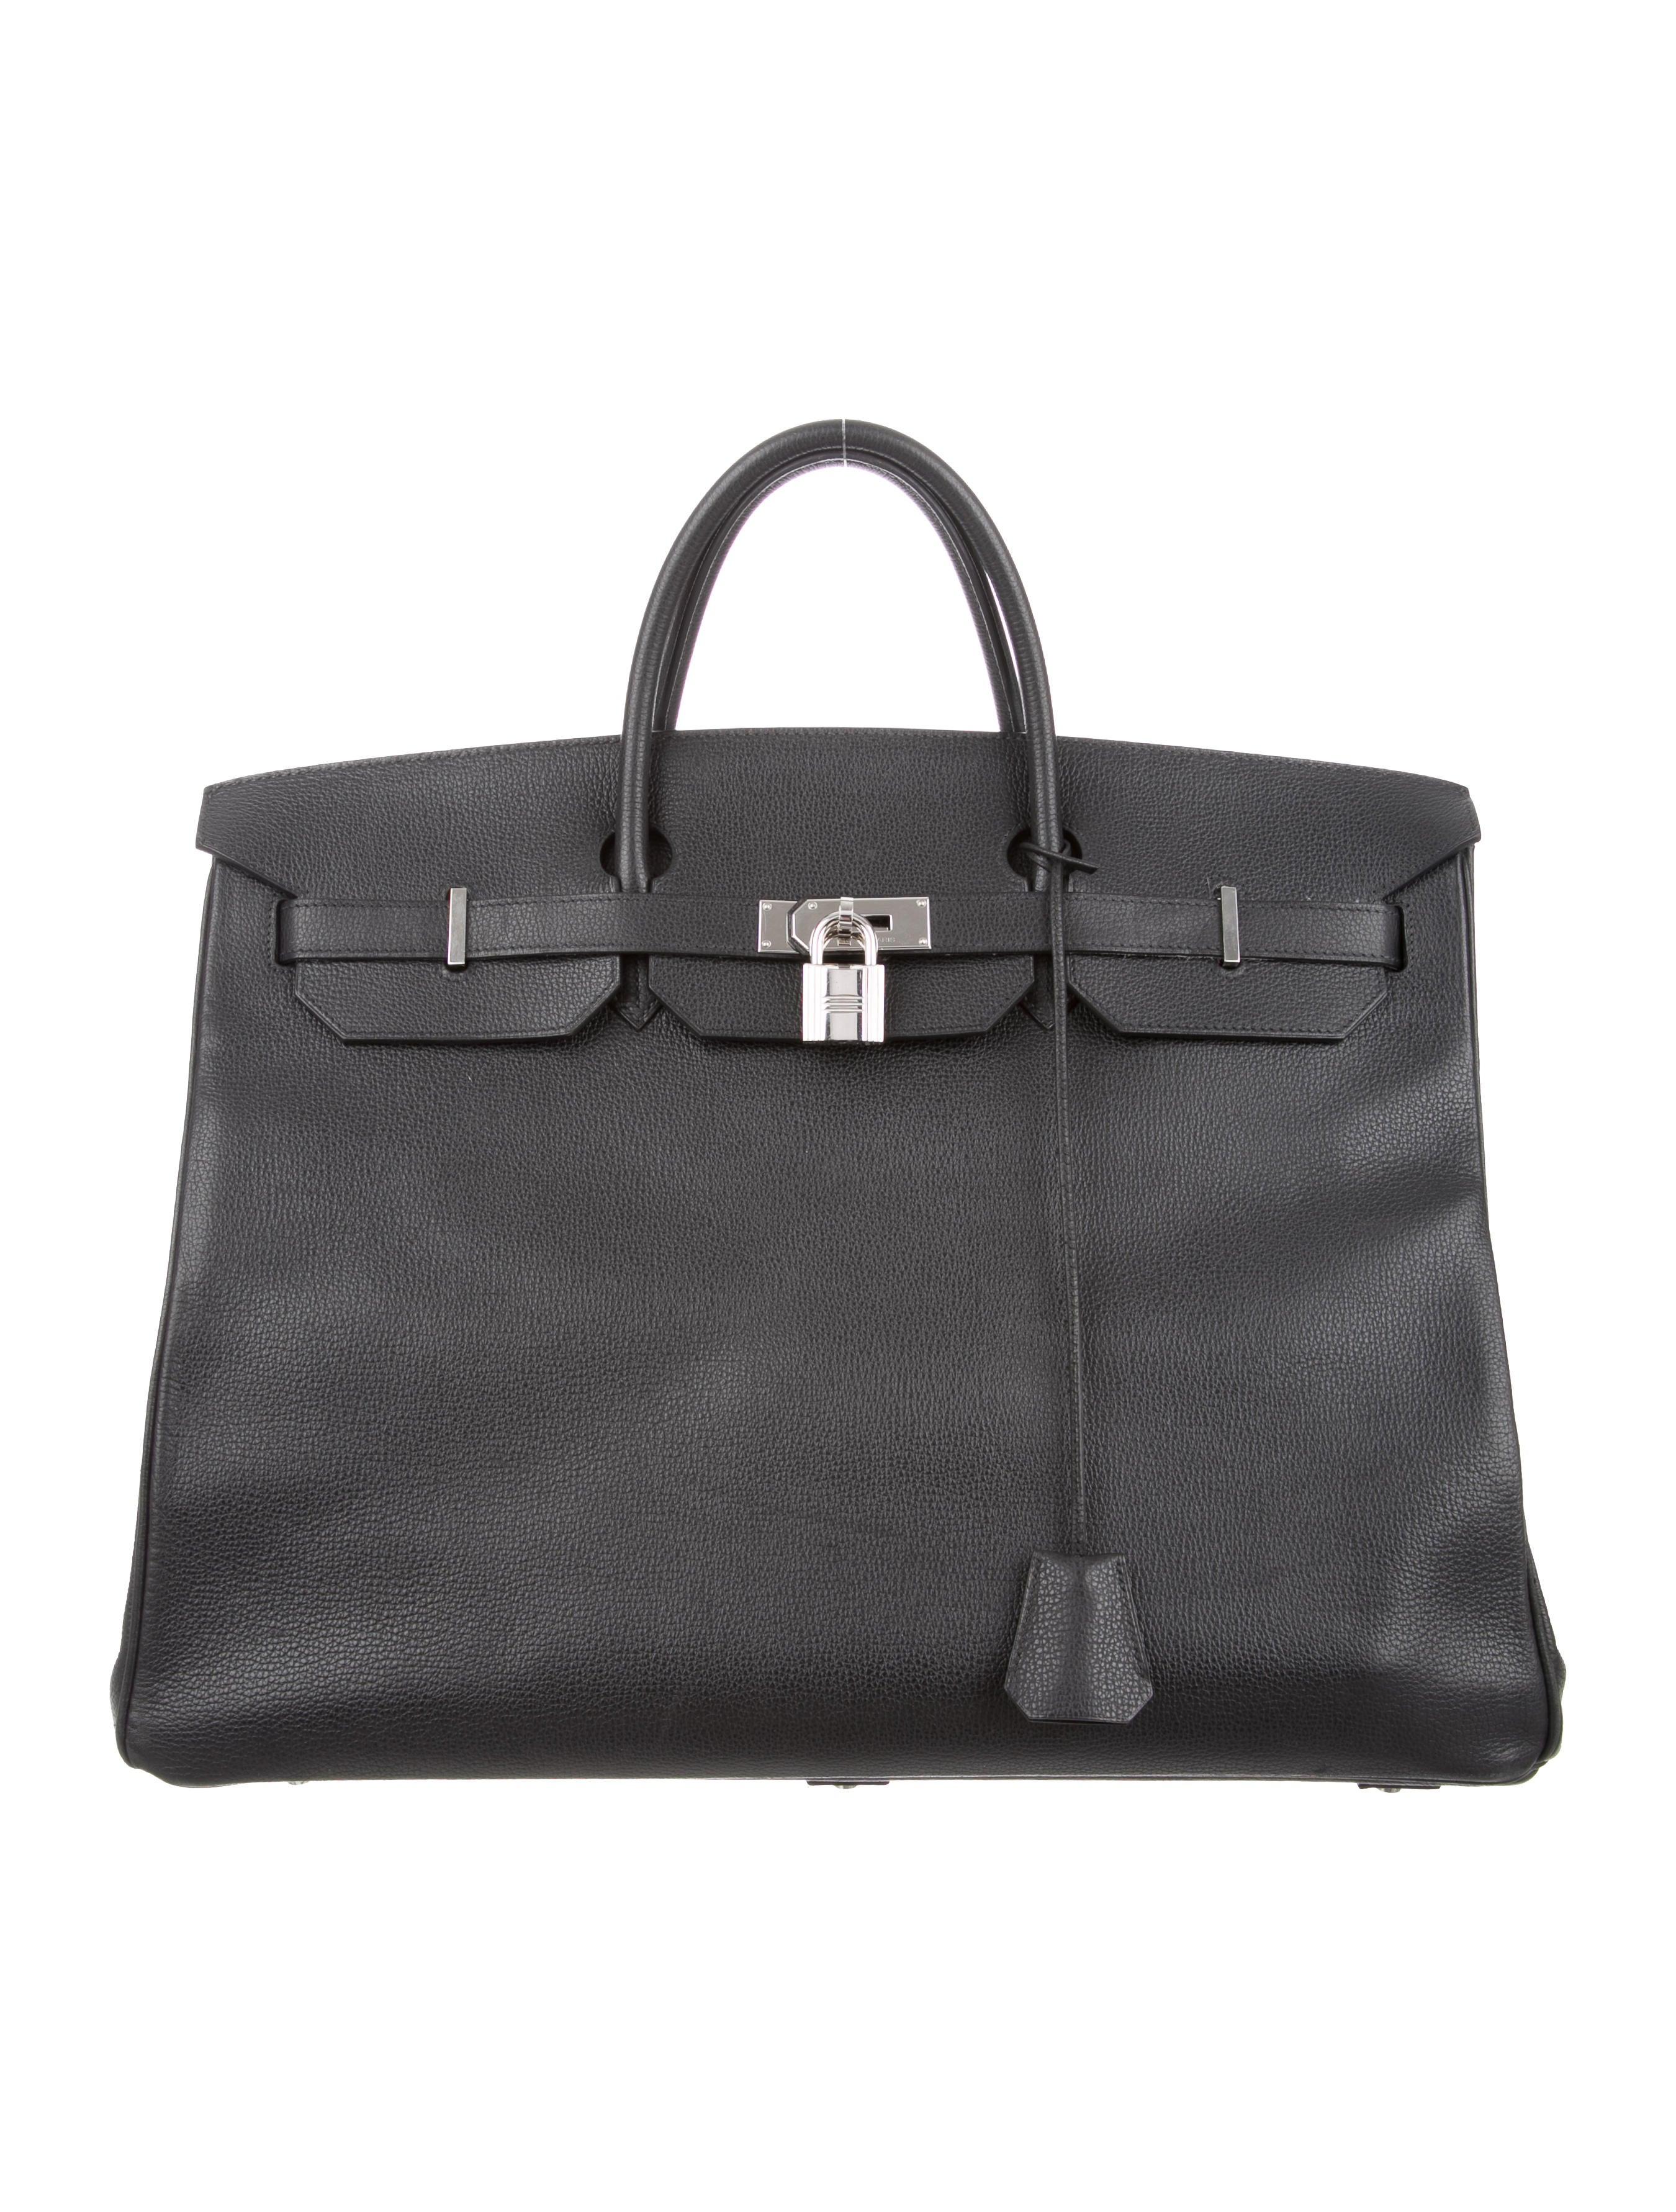 124a3e5c0096 Hermès Travel Birkin 50 - Bags - HER88538